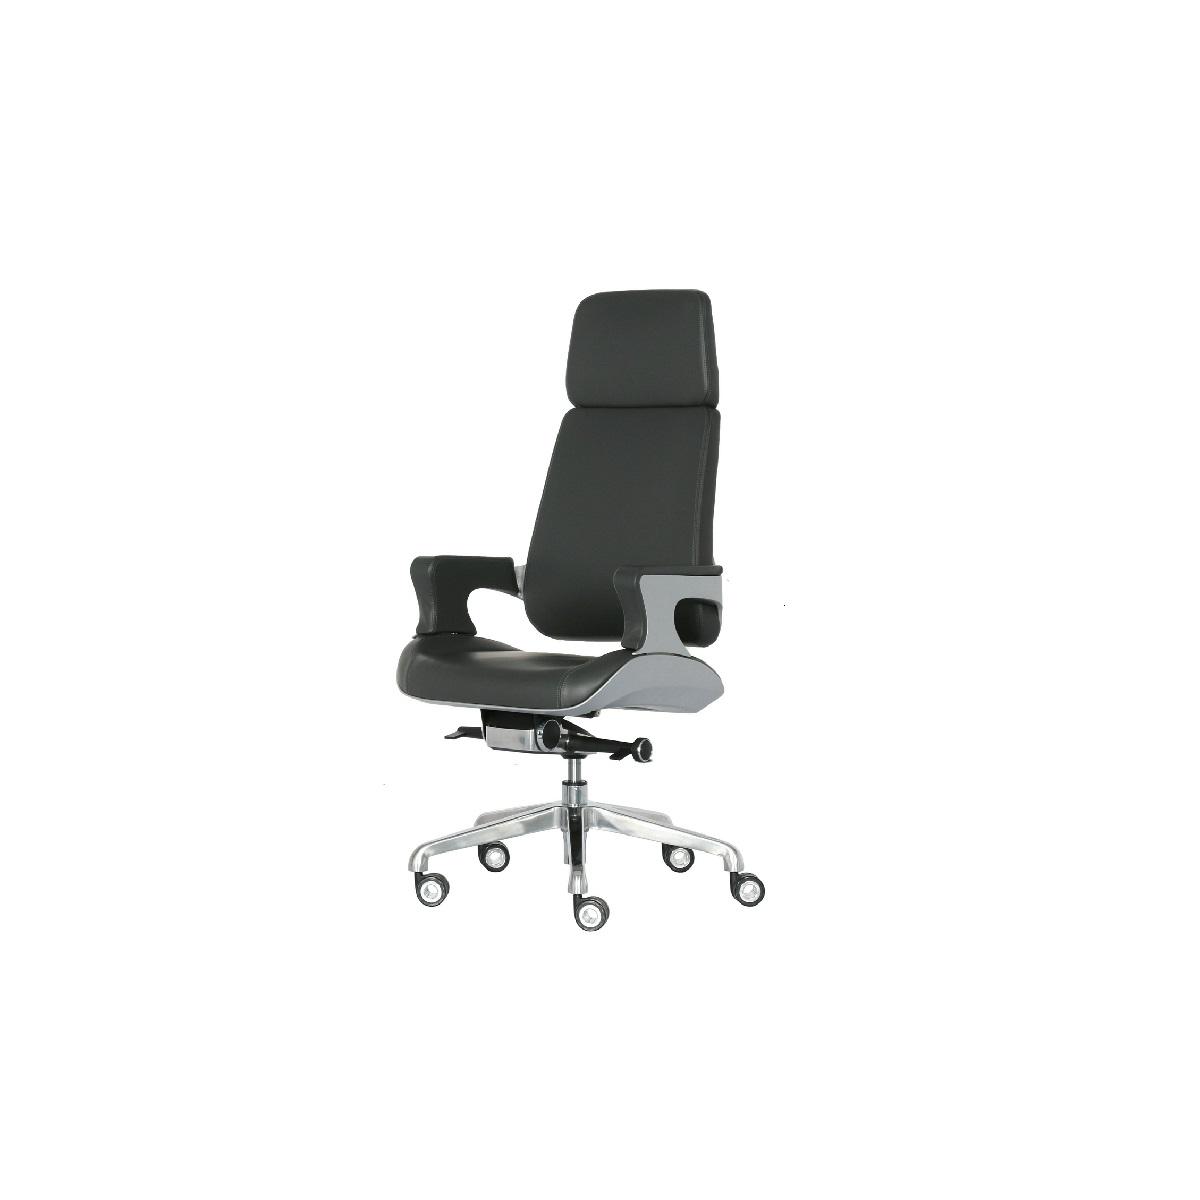 XW-18C人体工学椅 - 皮椅转椅